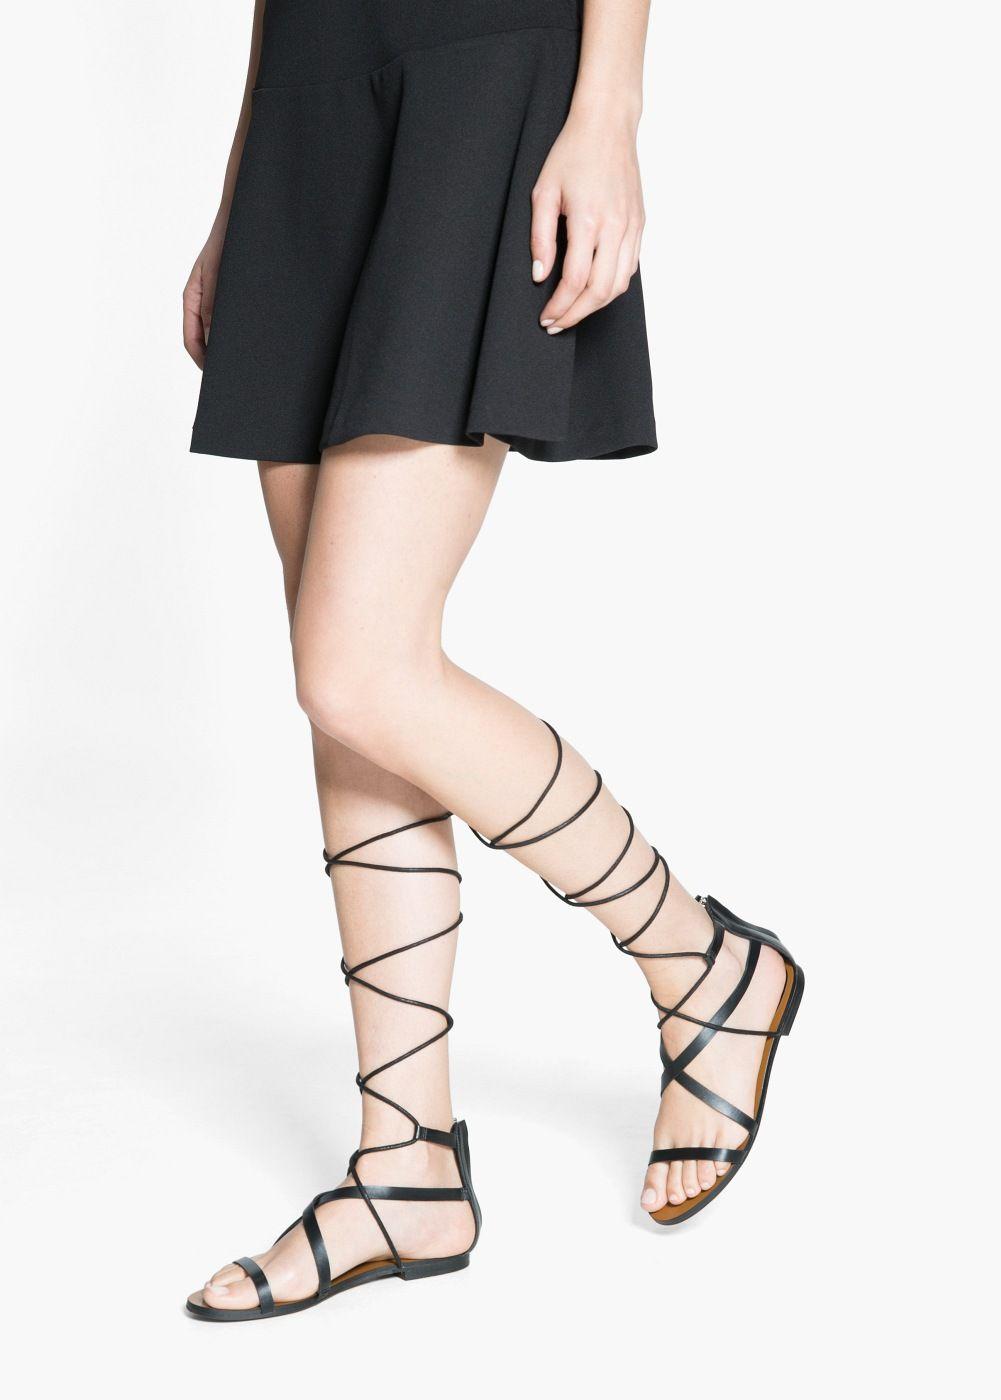 Strap cord sandals Women | Fashion, Stylish, Lace up sandals